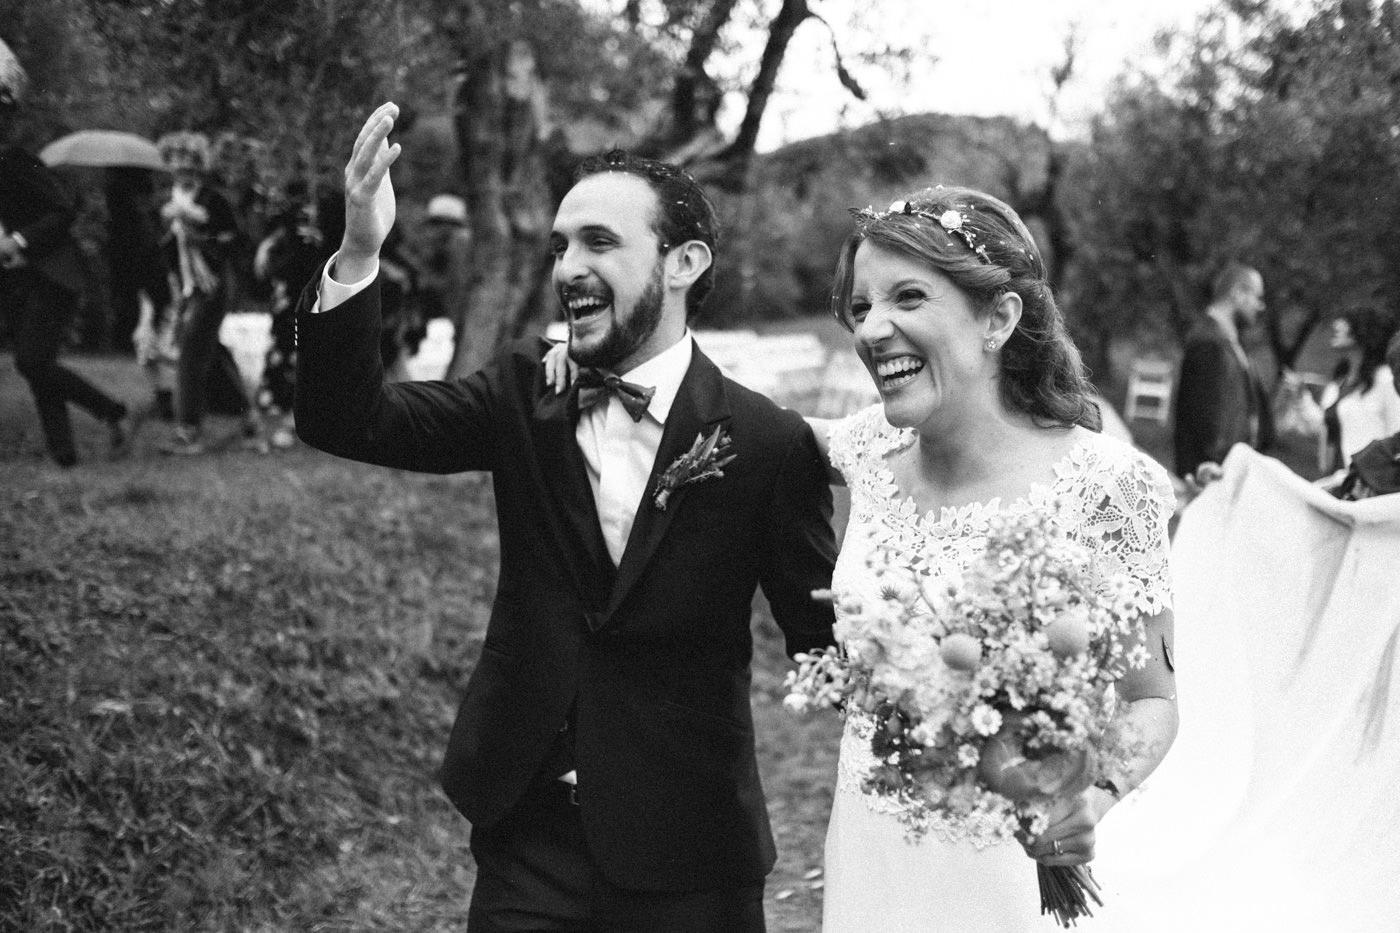 matrimoni_all_italiana_fotografo_matrimonio_toscana-49.jpg